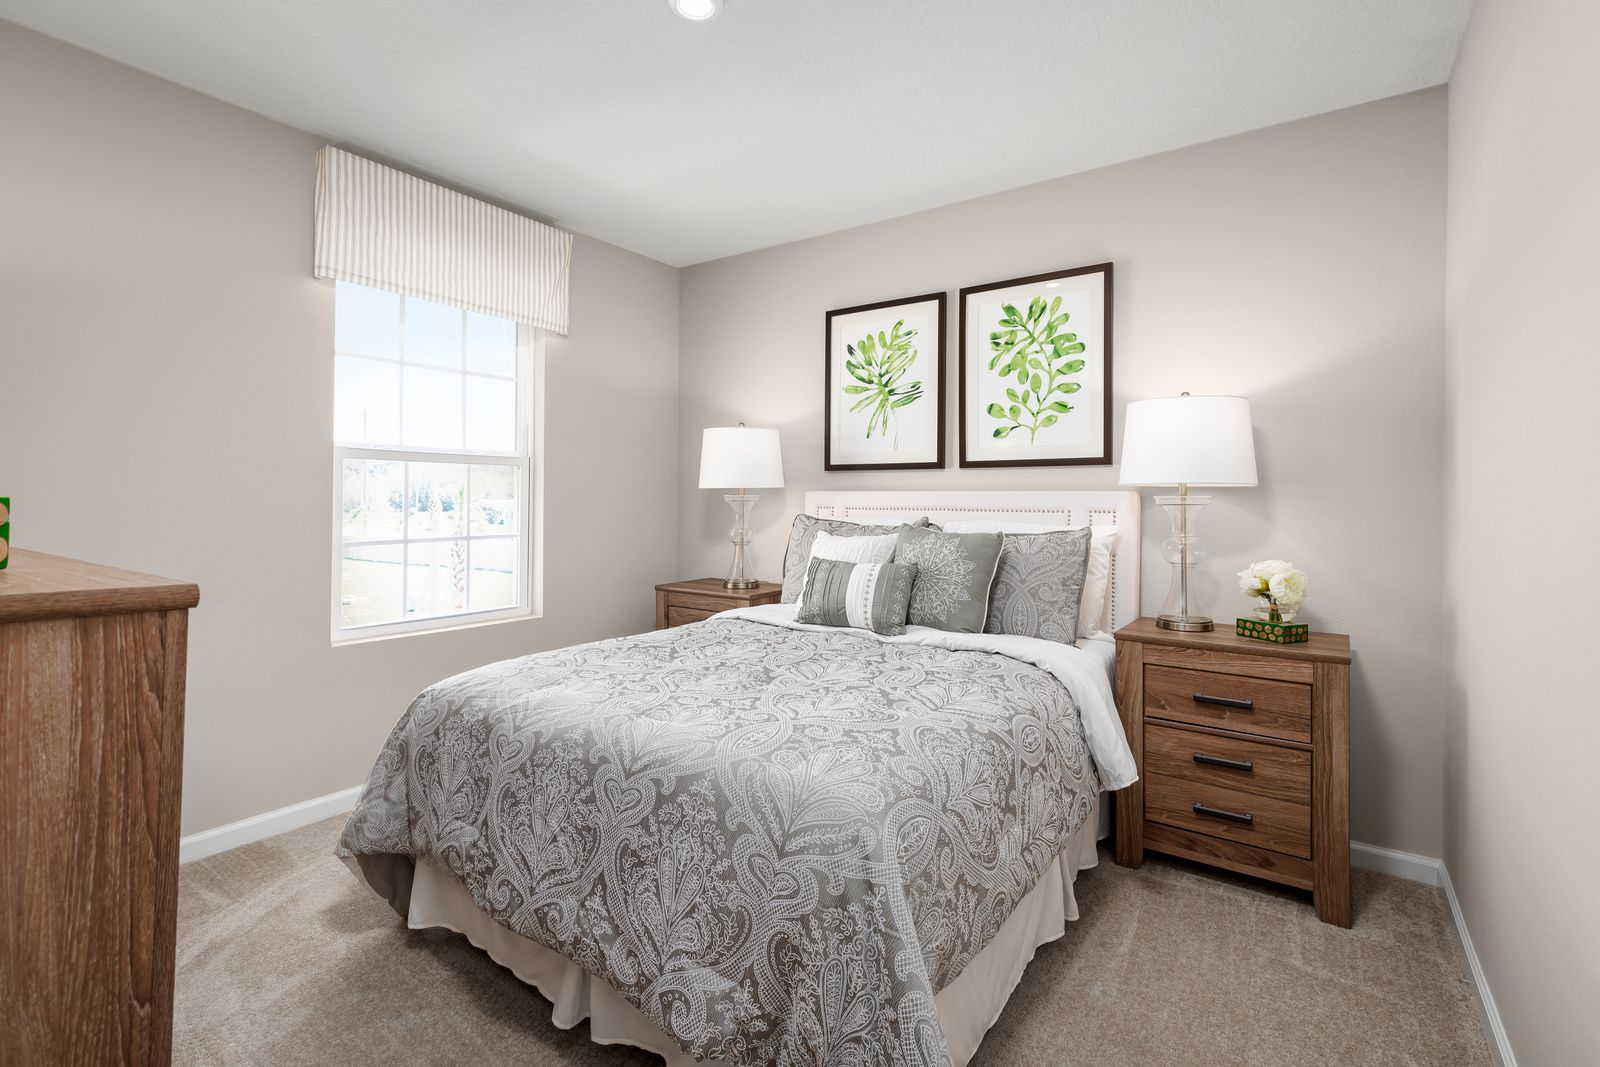 Bedroom featured in the Sweet Bay By Ryan Homes in Tampa-St. Petersburg, FL